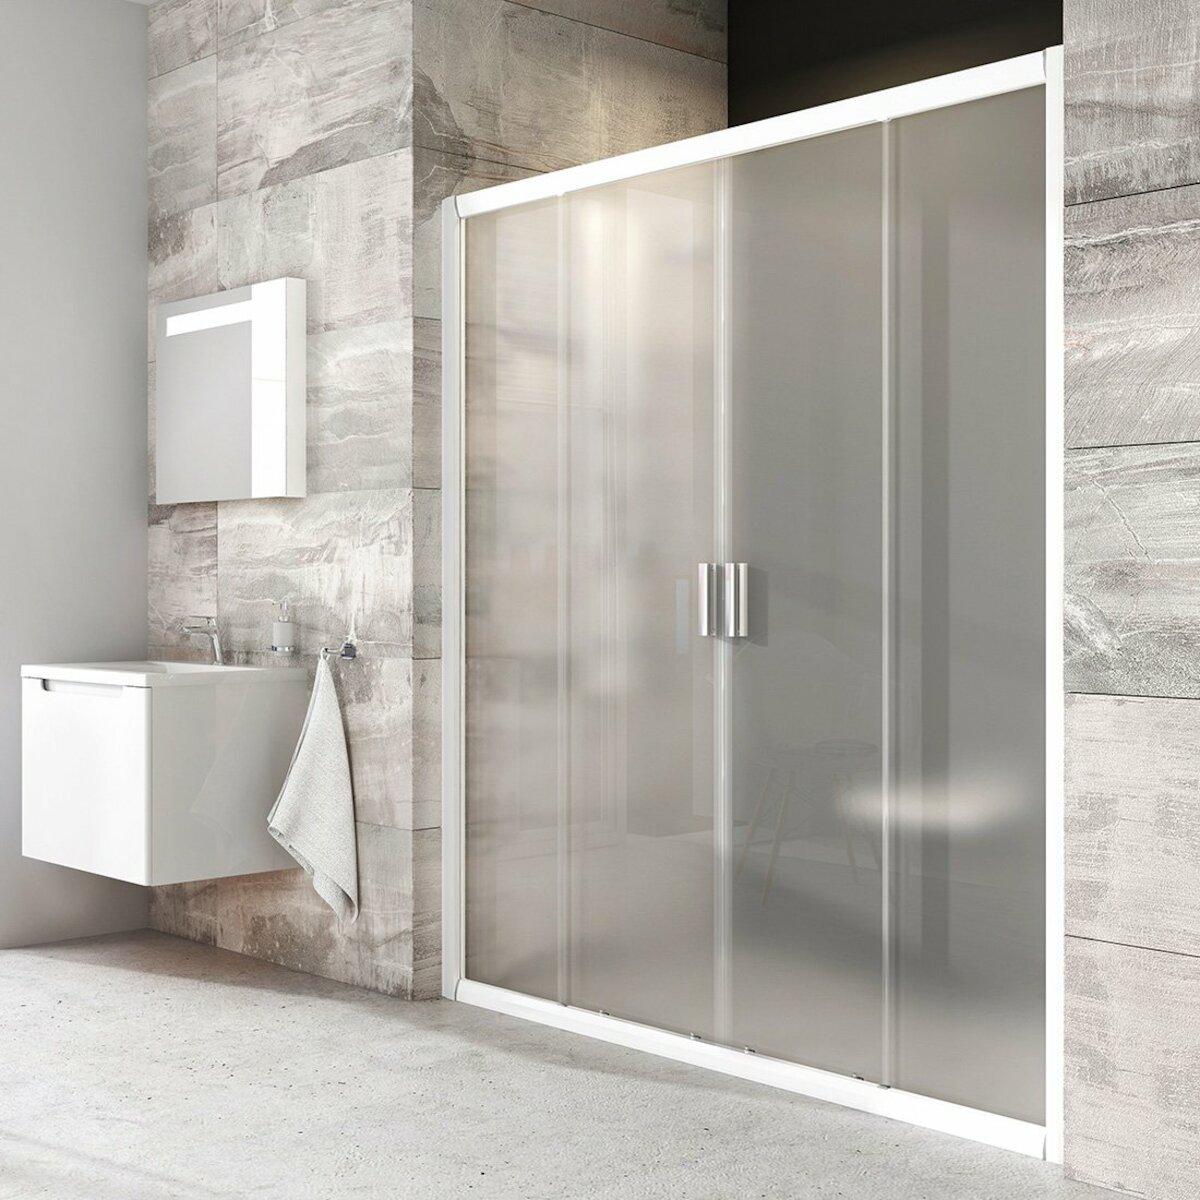 Sprchové dvere 130x190 cm Ravak Blix biela 0YVJ0100ZG